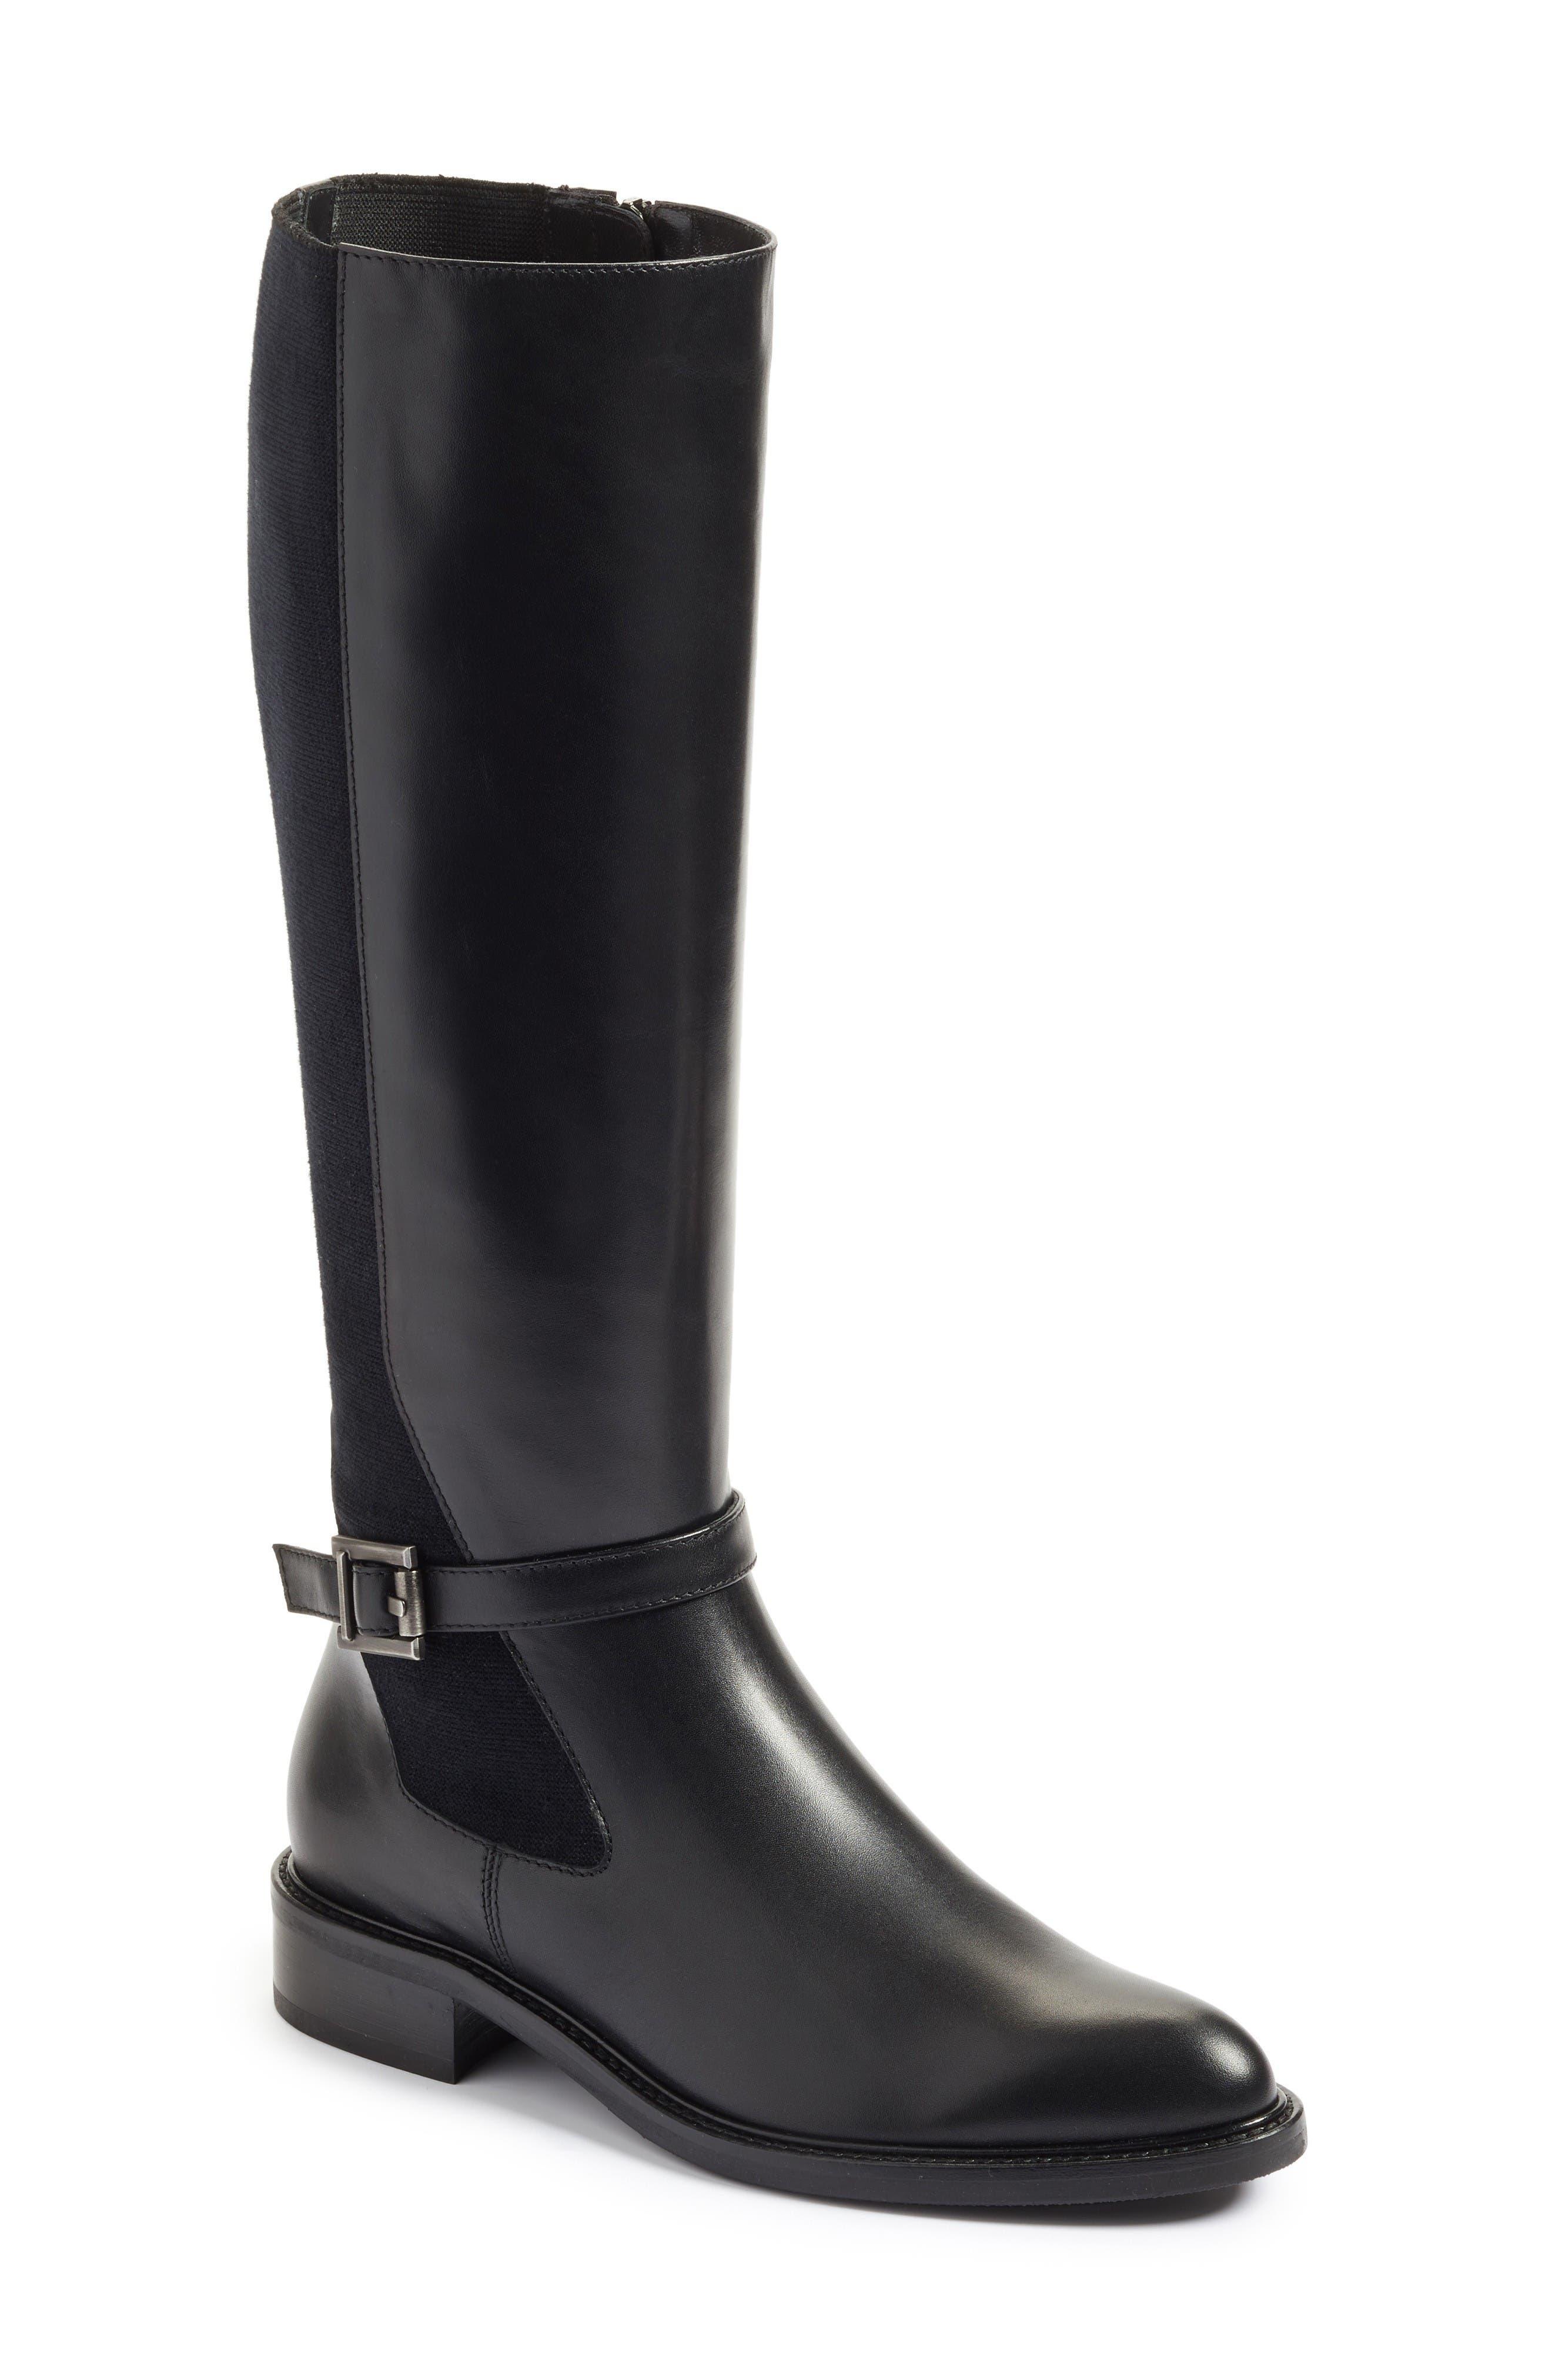 Alternate Image 1 Selected - Aquatalia Genna Weatherproof Tall Boot (Women)